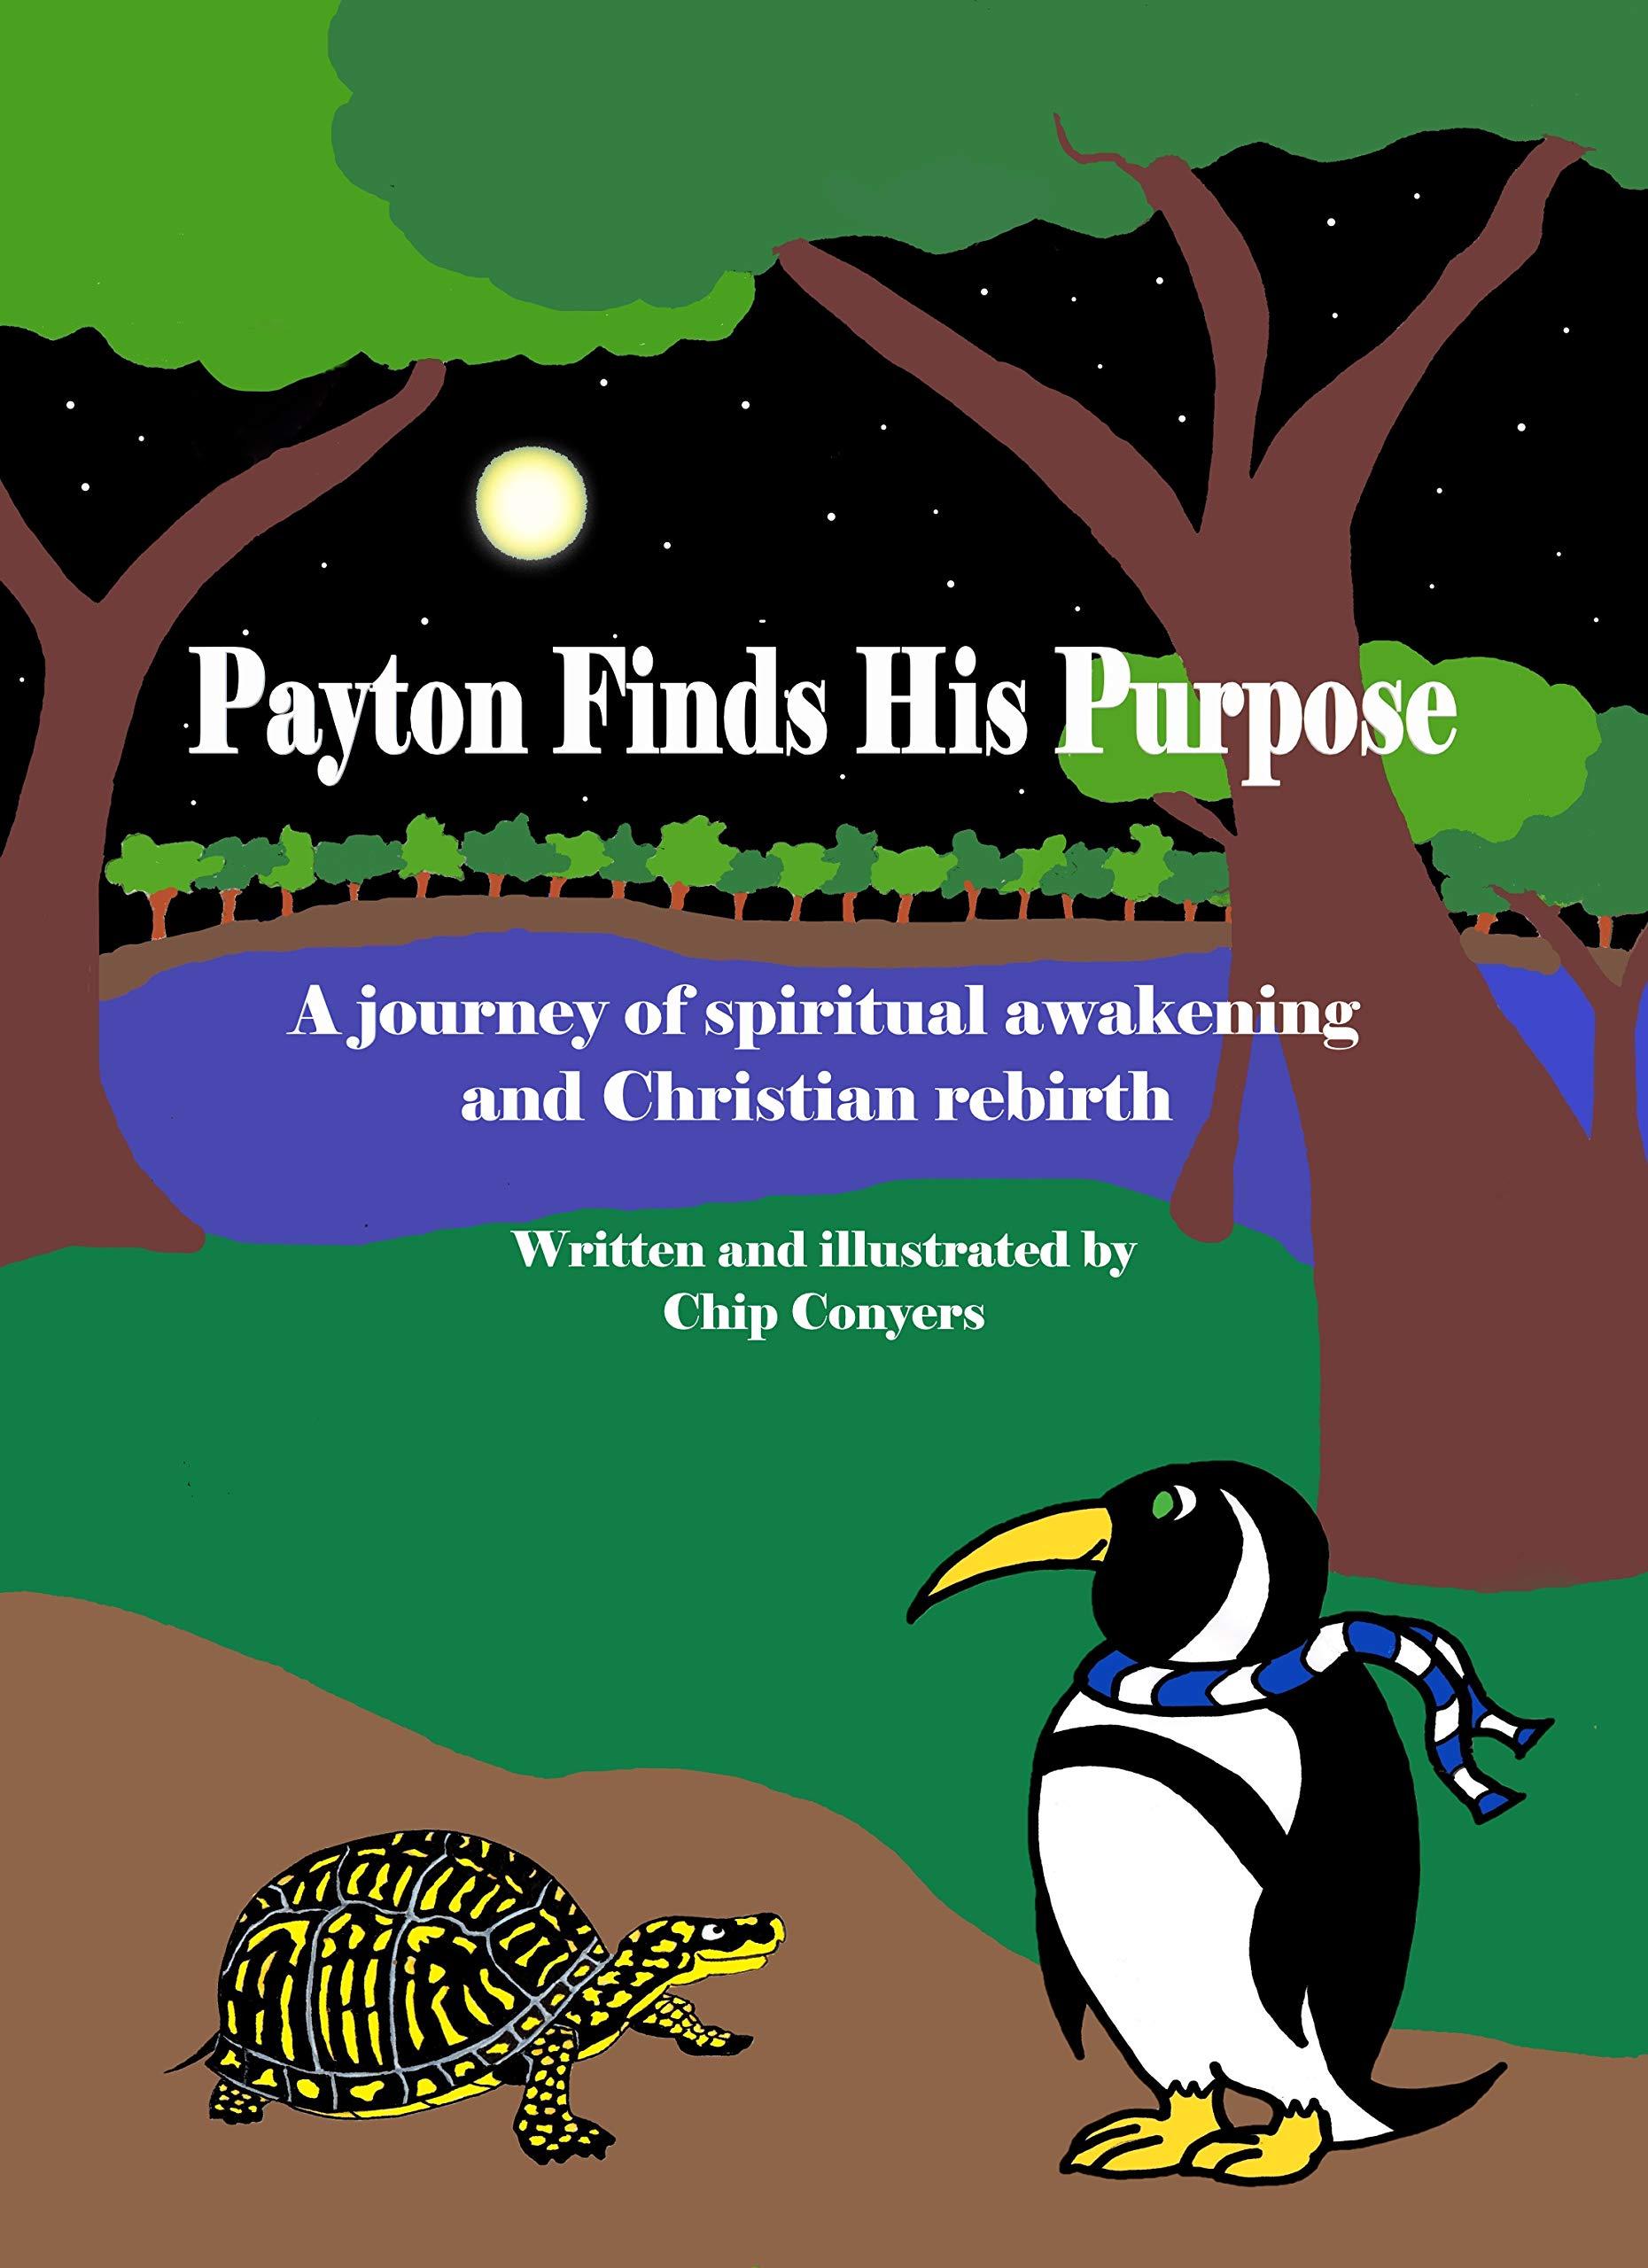 Payton Finds His Purpose: A journey of spiritual awakening and Christian rebirth